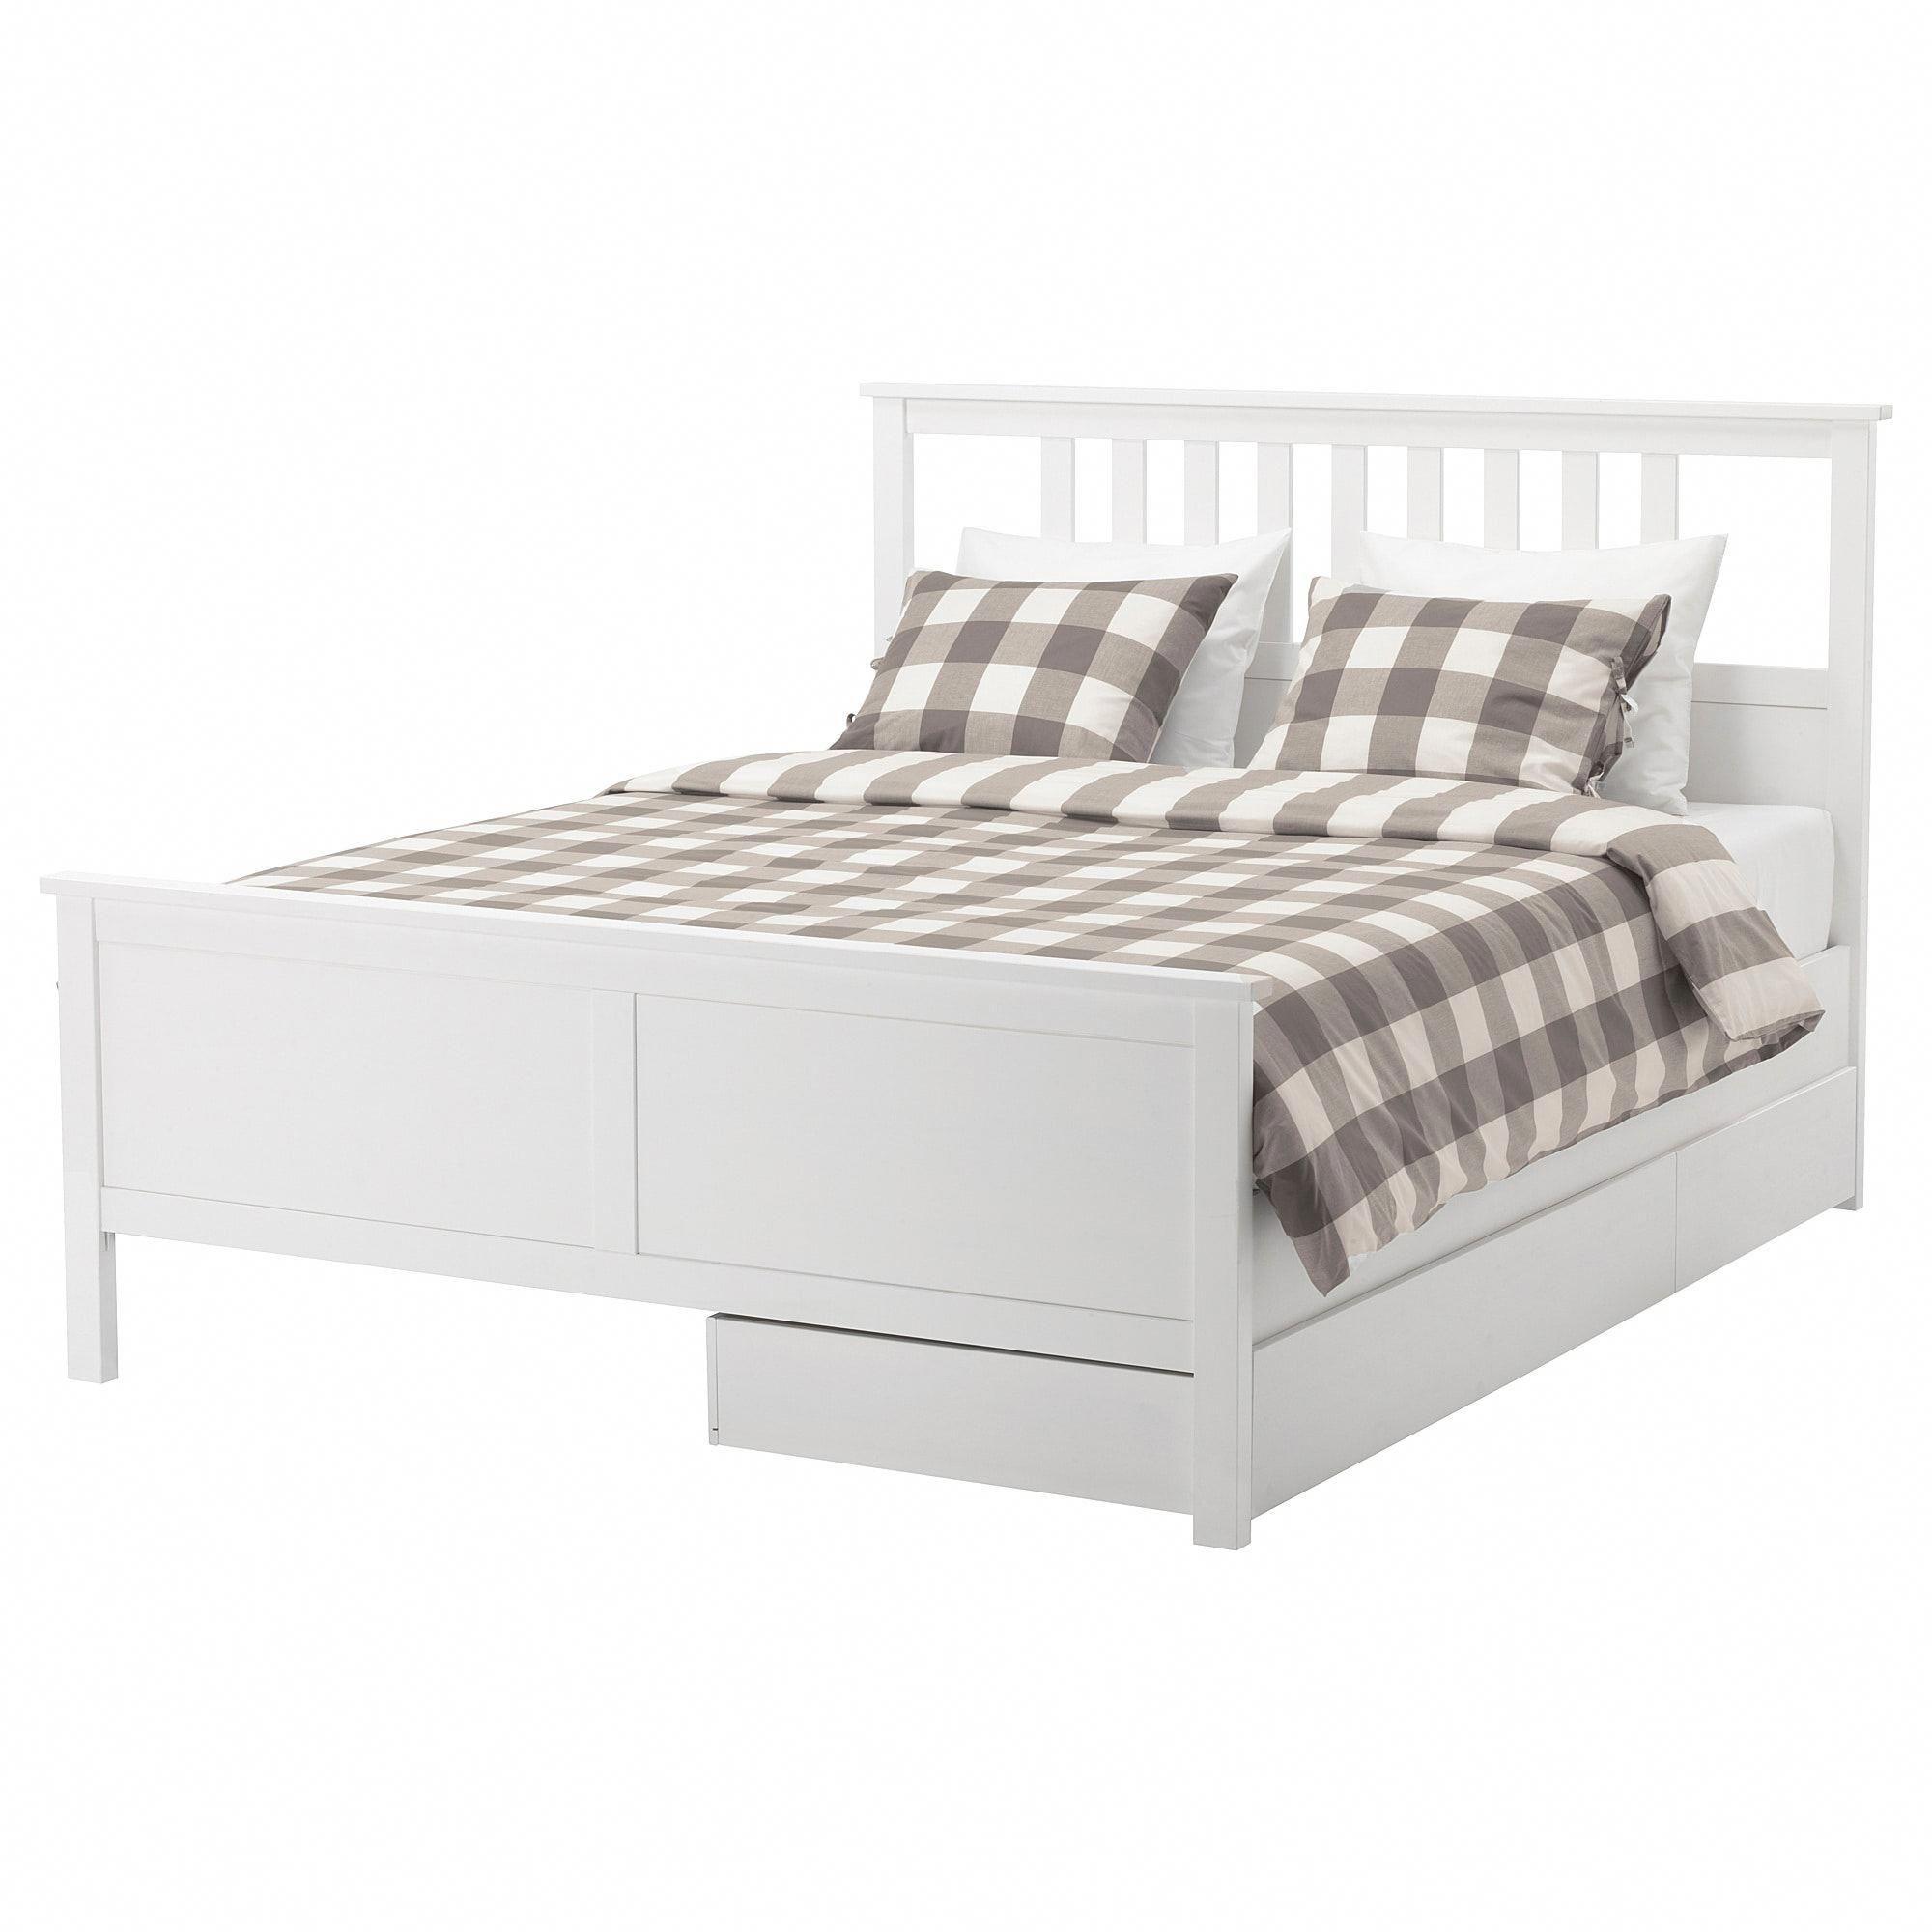 IKEA HEMNES White Stain, Leirsund Bed frame with 2 storage